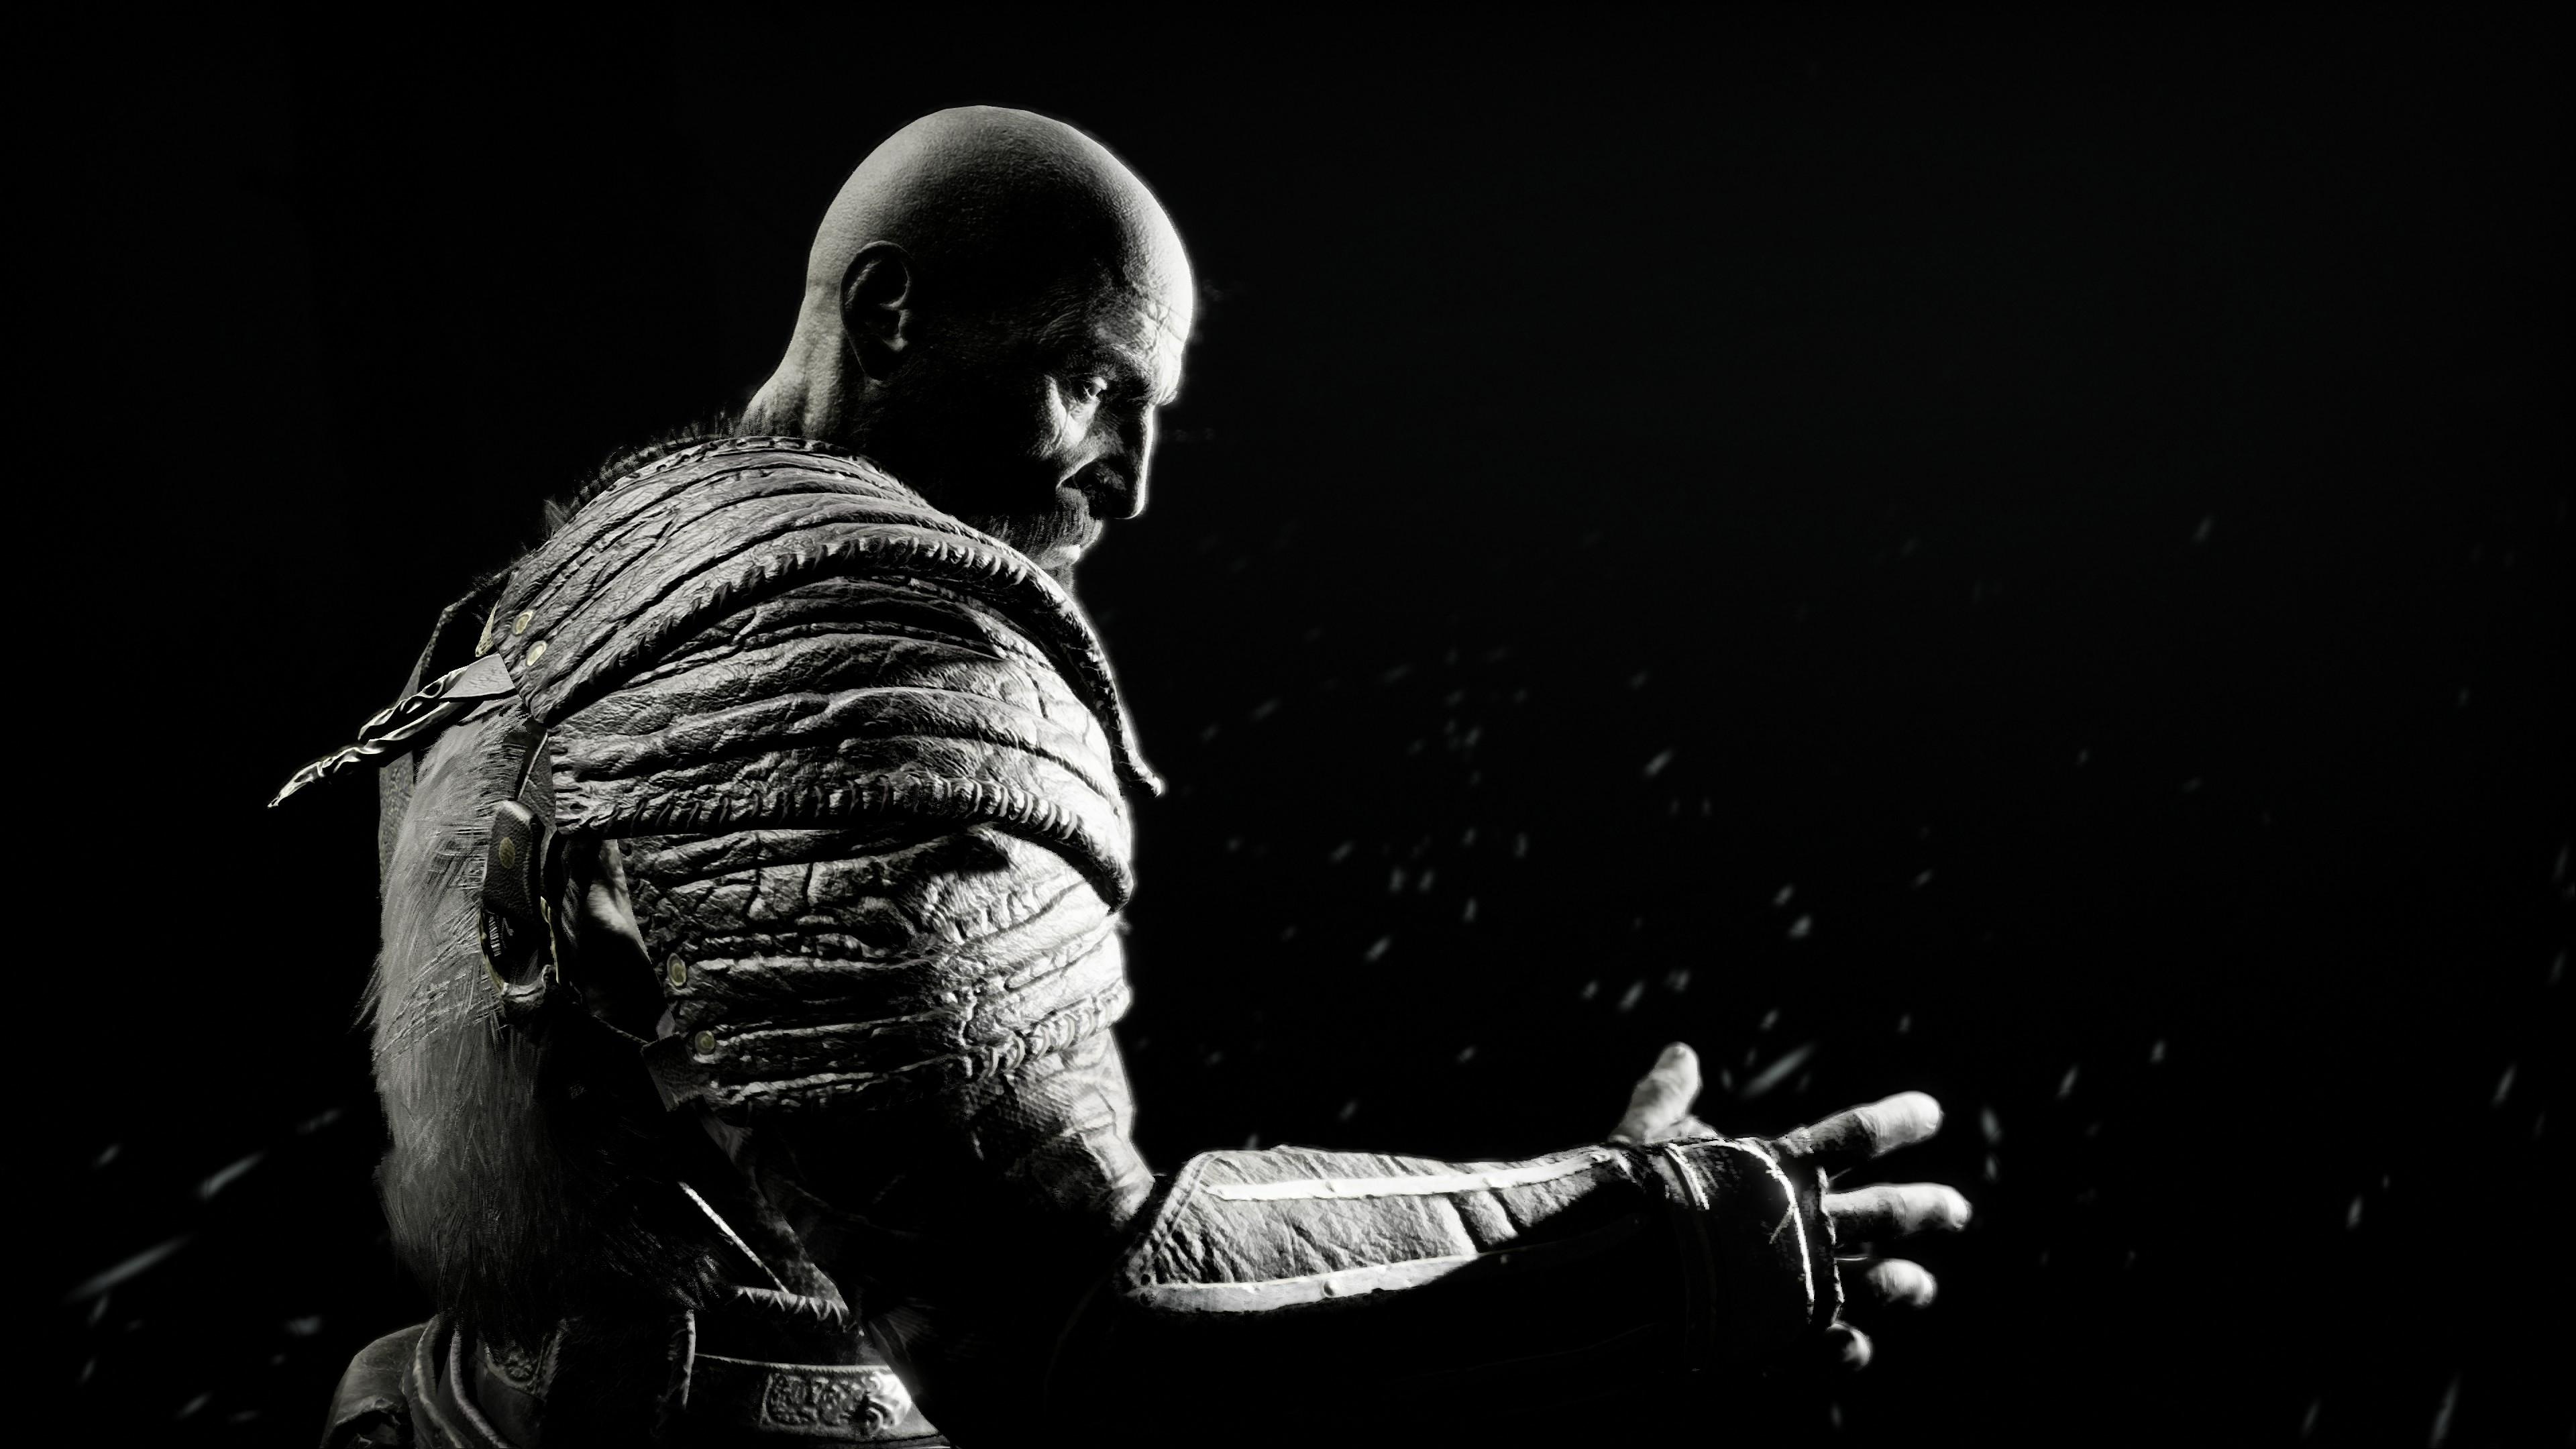 God Of War 2018 4k Ultra Hd Wallpaper Background Image